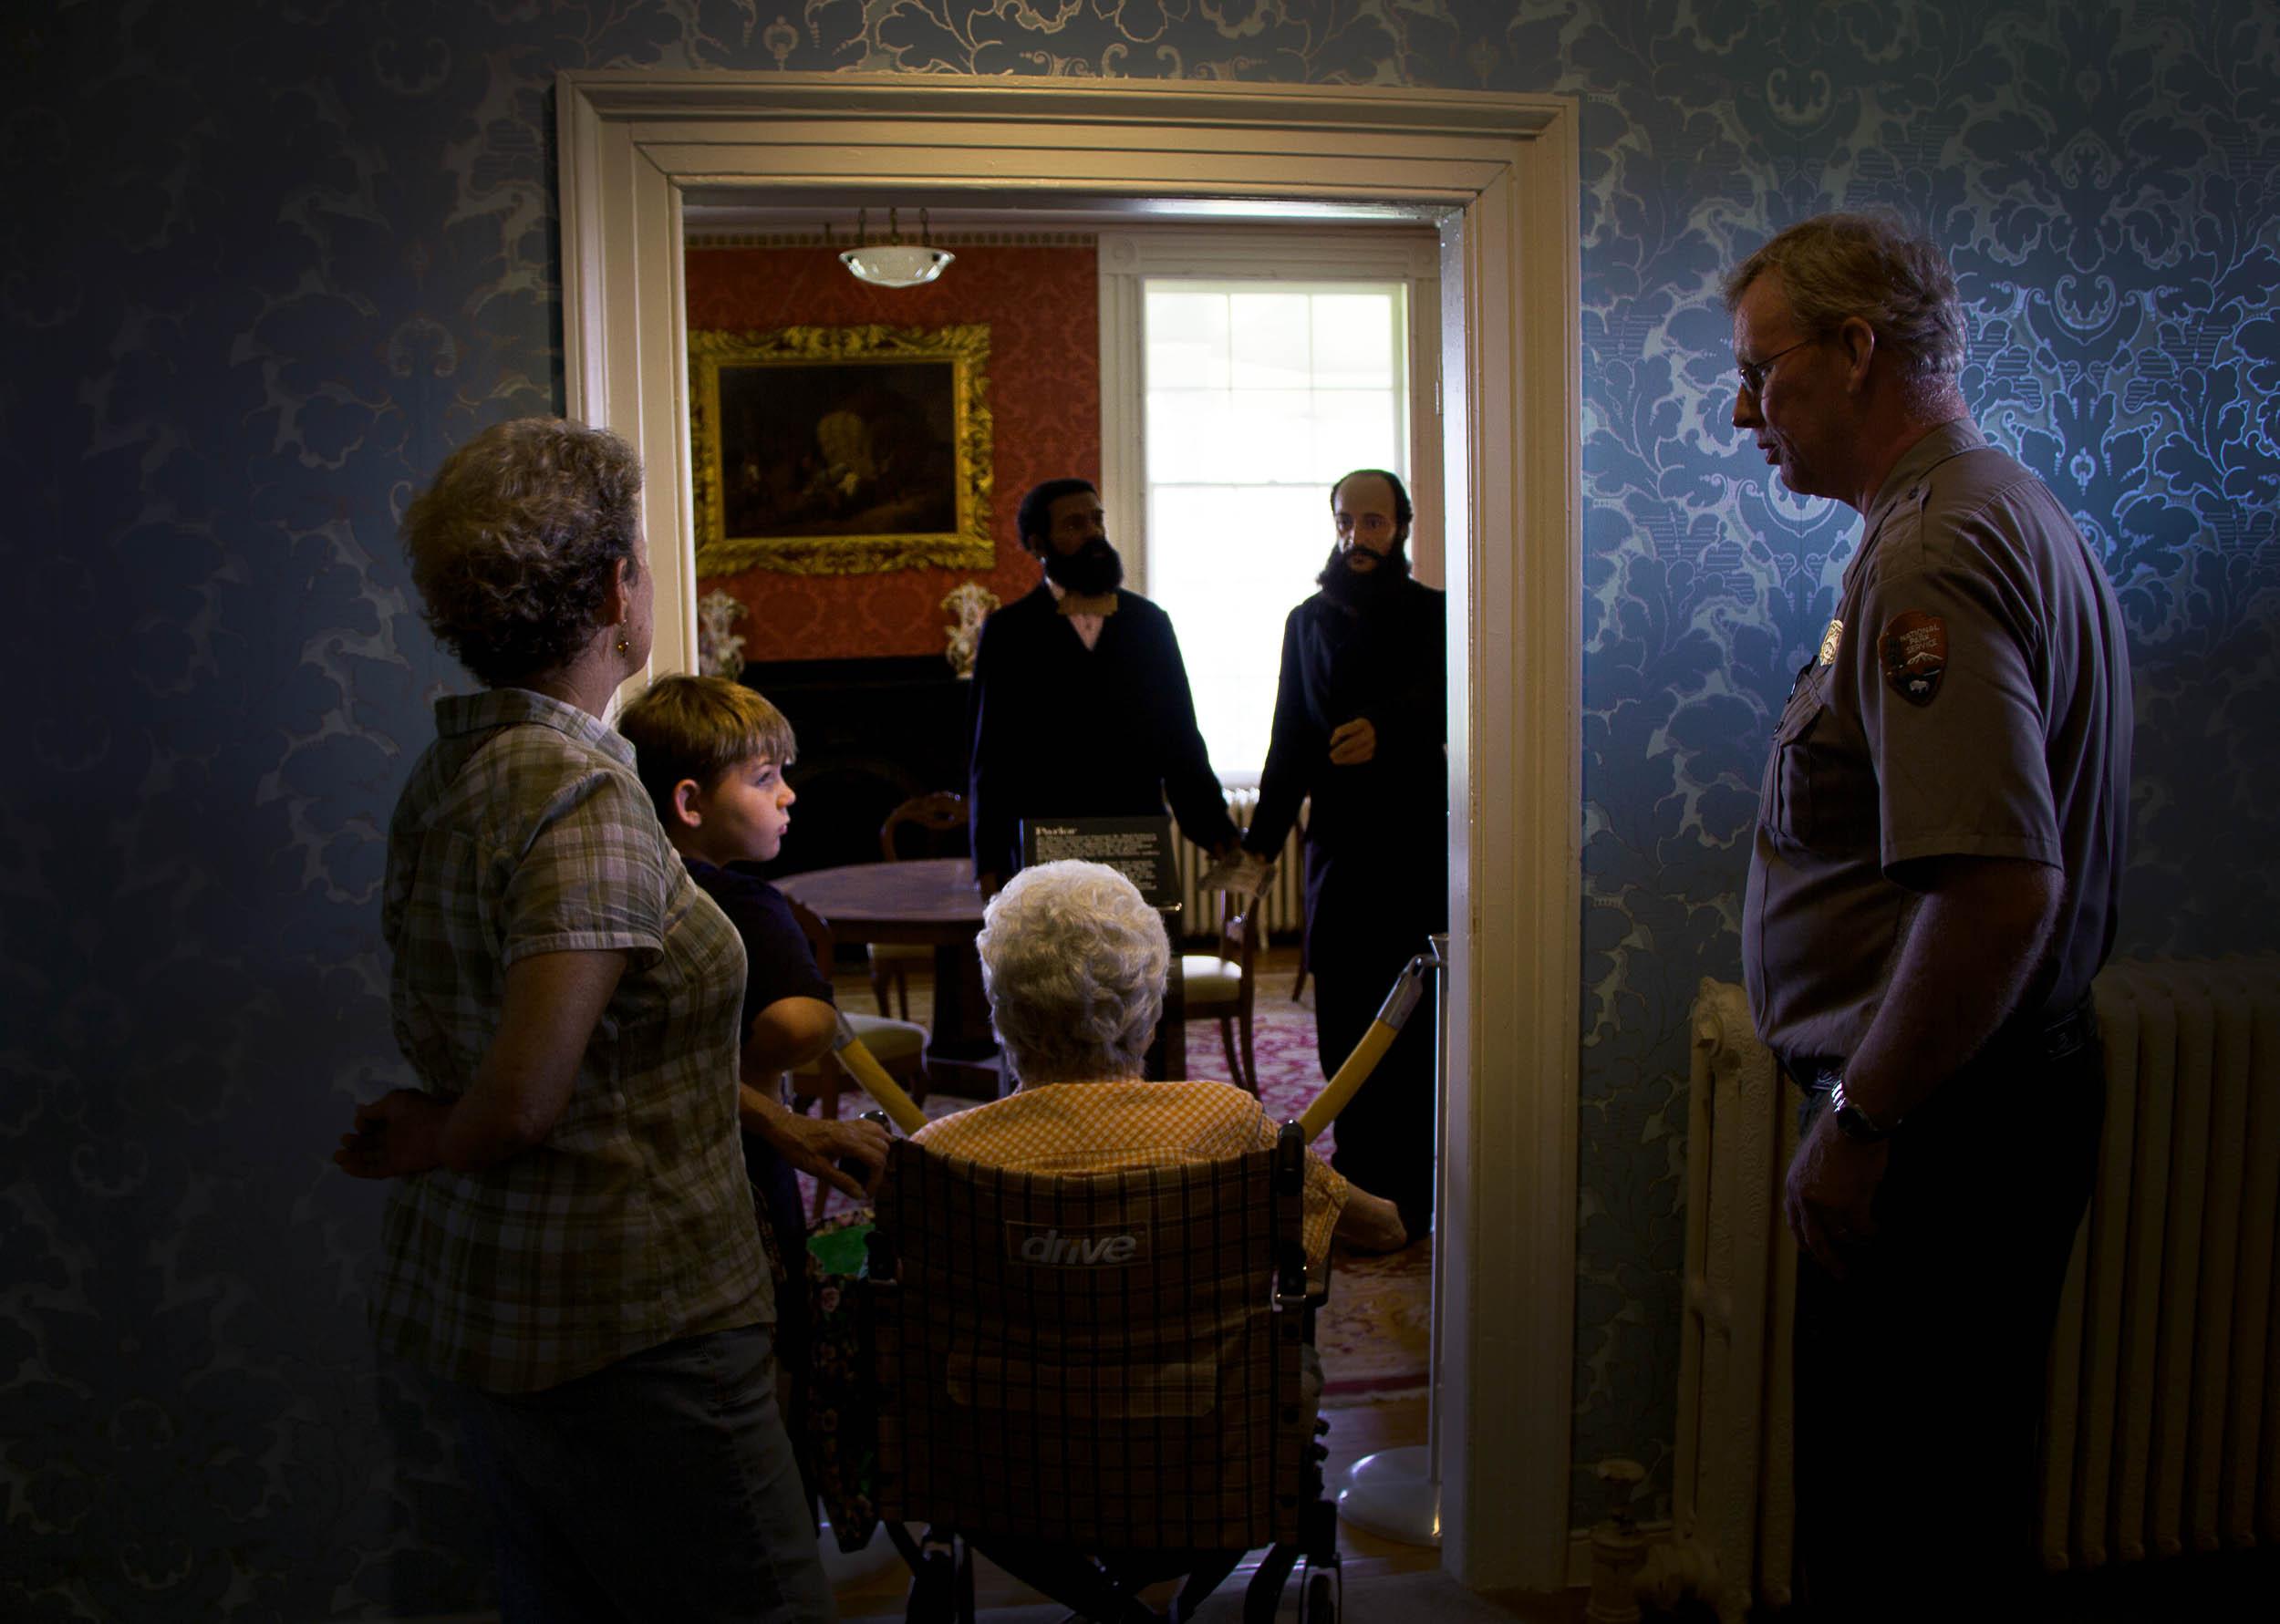 Appomattox Manor, Virginia